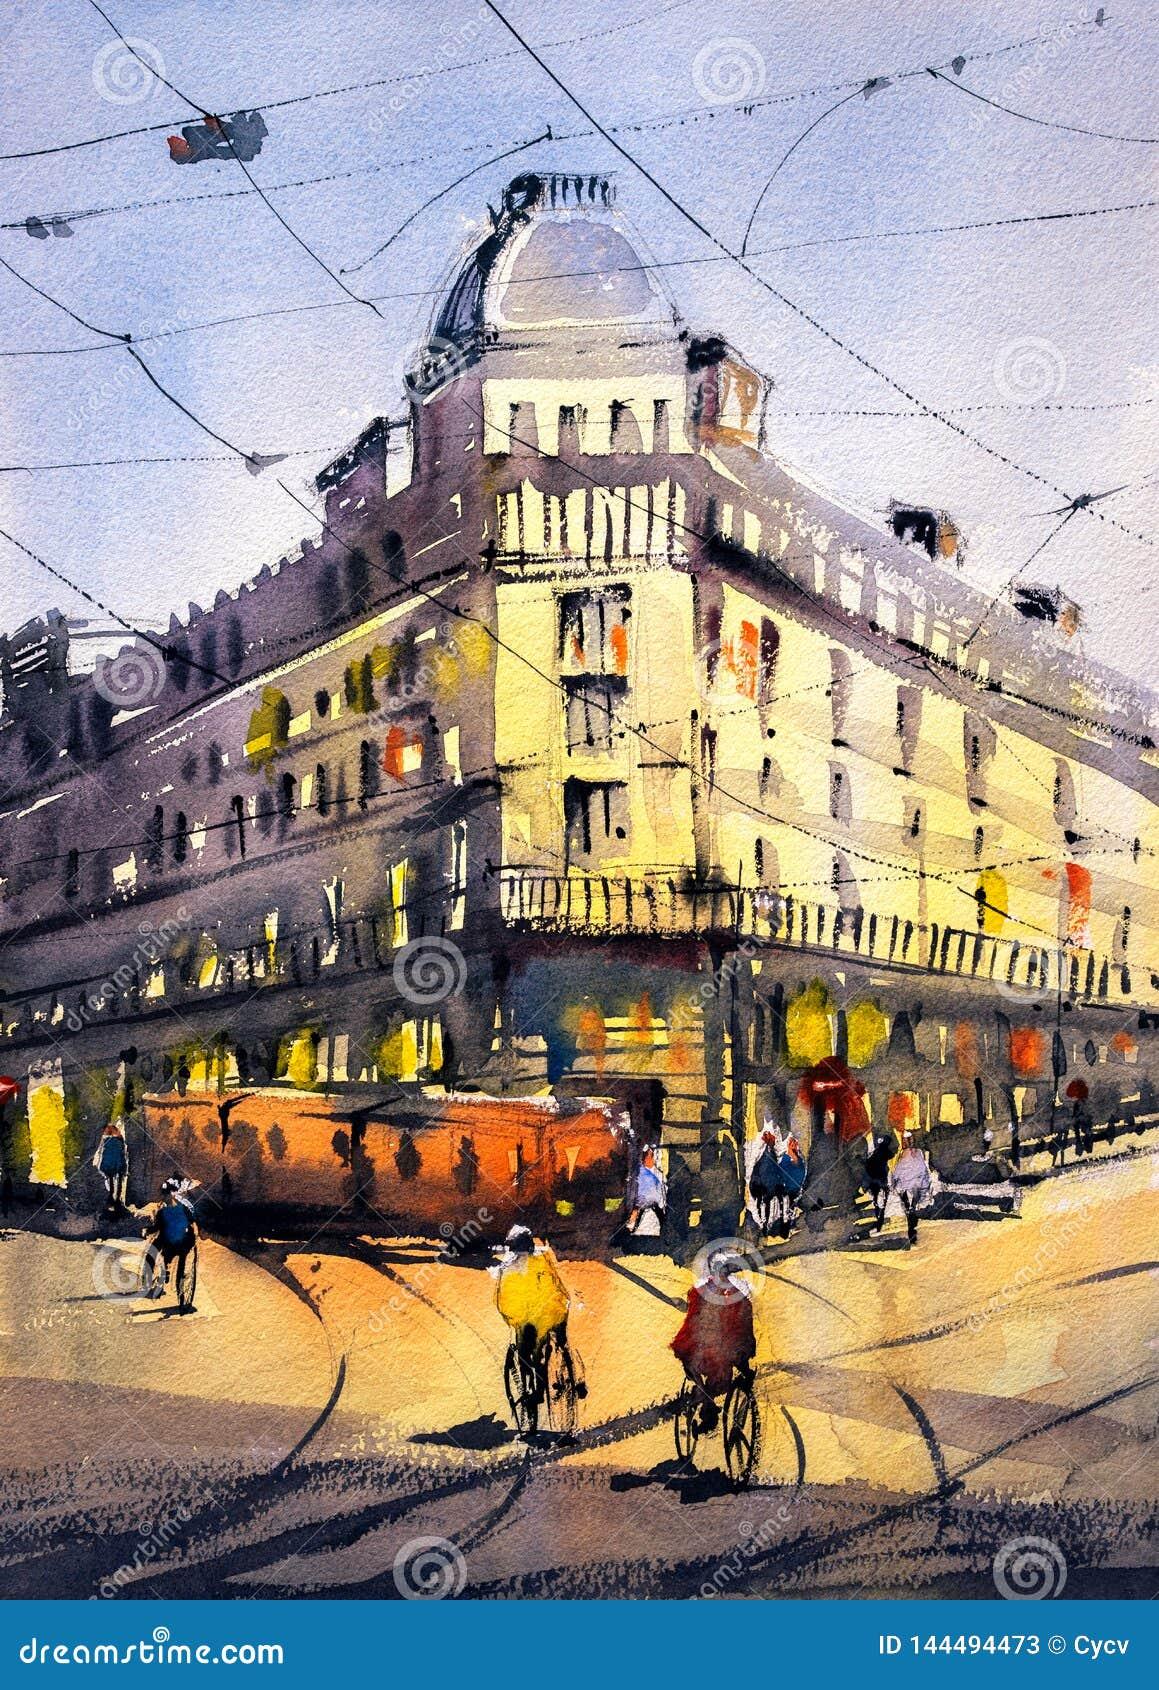 Aquarell-Malerei - Street View von Paris